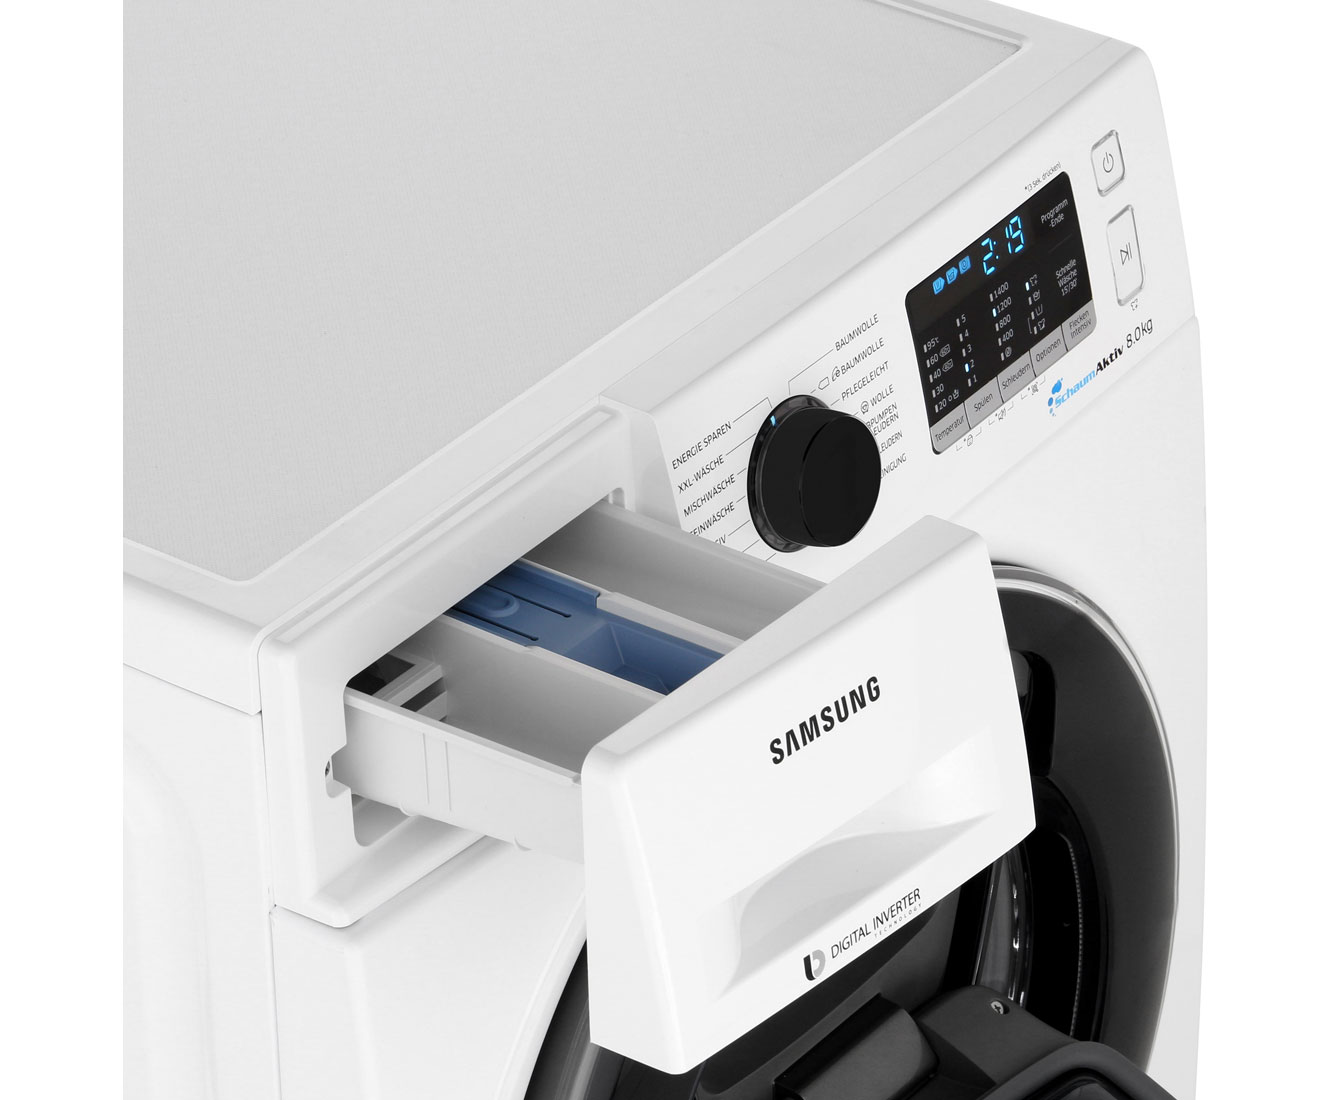 Samsung Addwash 5500 Ww80K5400Uw Waschmaschine 8 Kg, 1400 U/Min, A+++